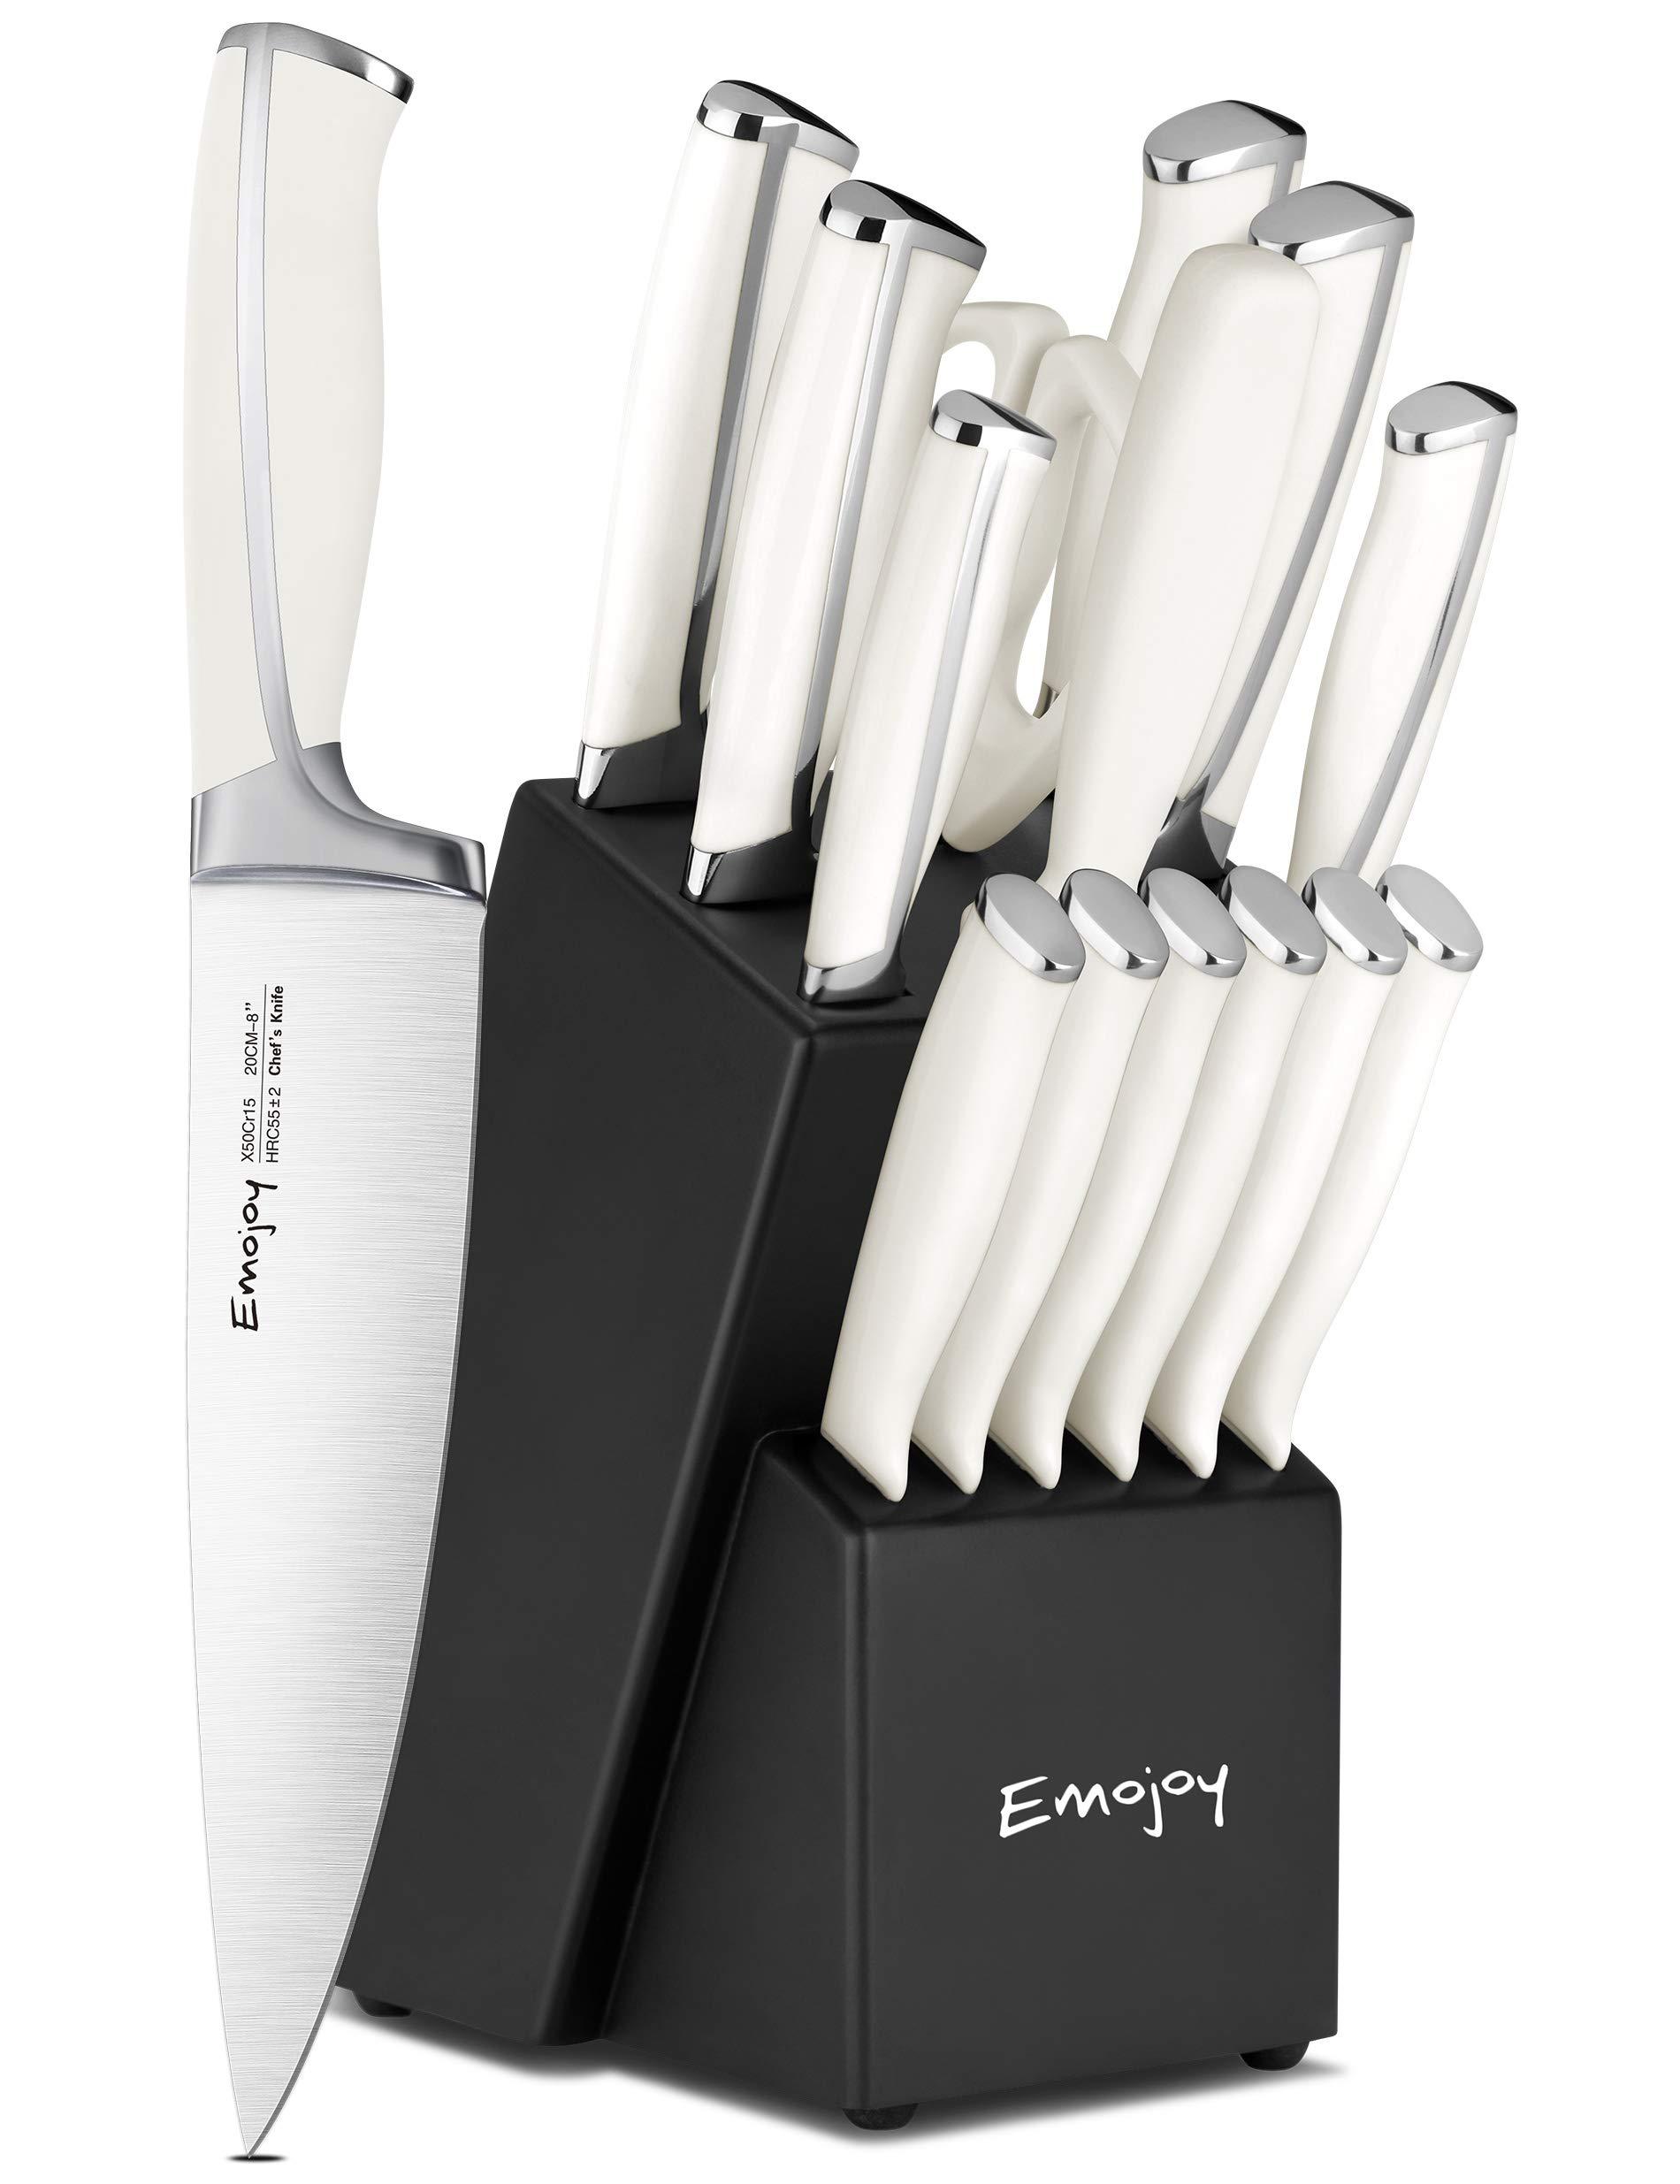 Emojoy Knife Set, 15-Piece Kitchen Knife Set with Block, ABS Handle for Chef Knife Set, German Stainless Steel, Emojoy (White).